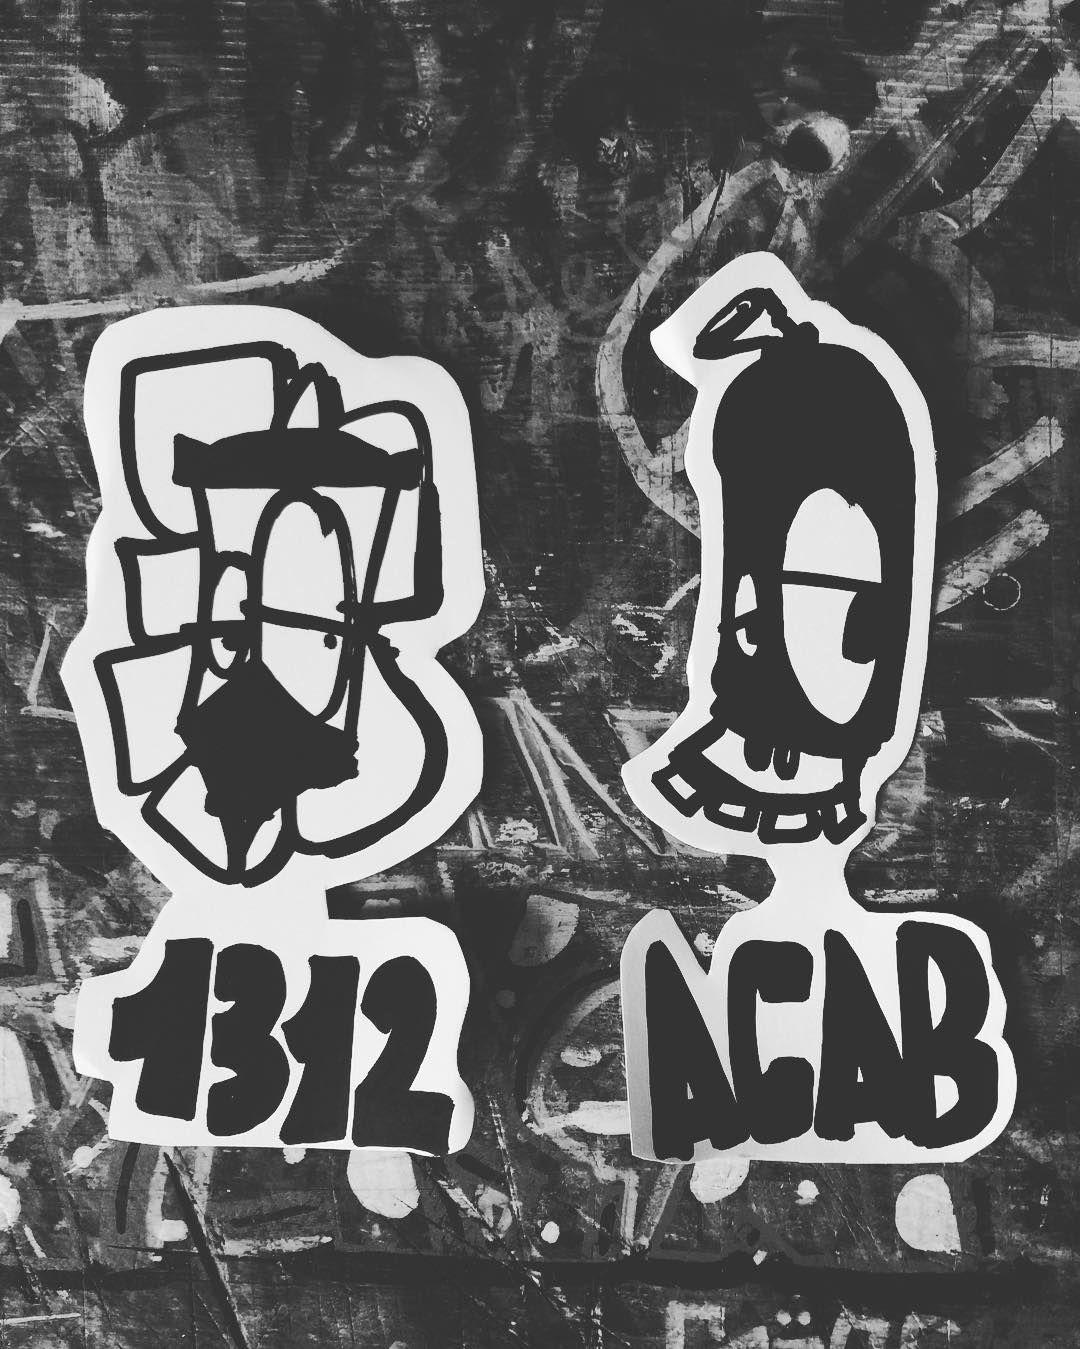 1312 ACAB 21107 Sticker #streetart #work #selfmade #hamburg #dr.shakewell